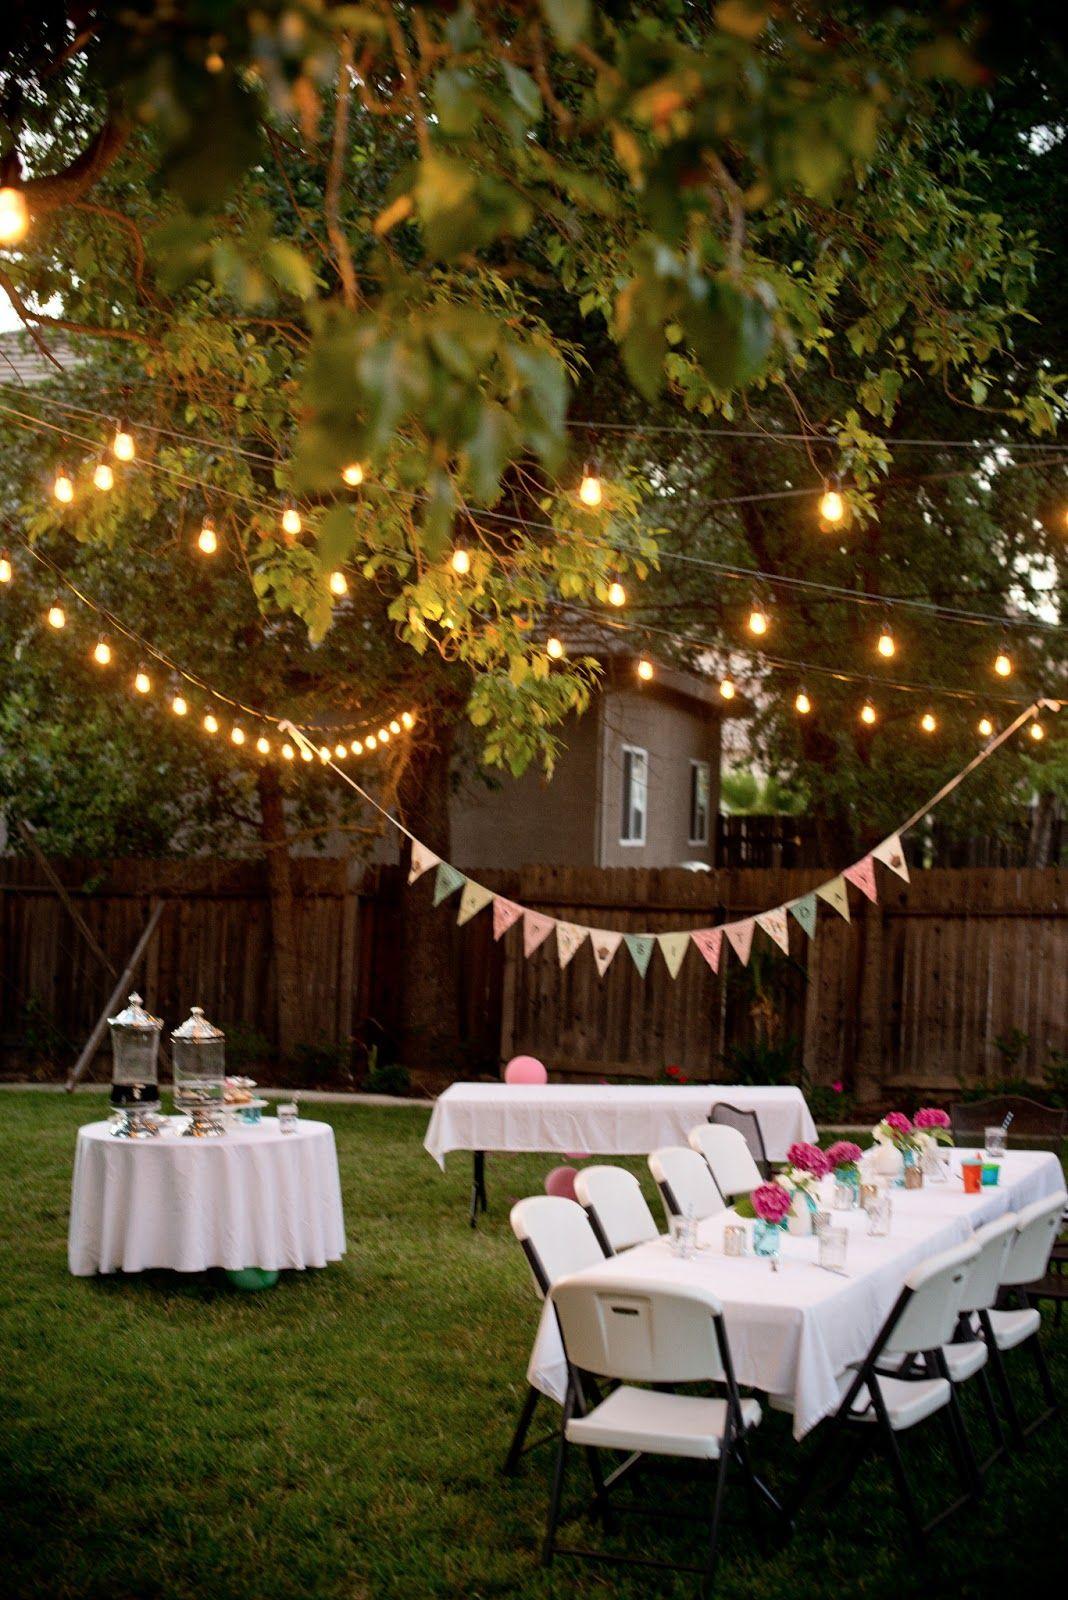 16.SIMPHOME.COM backyard birthday fun pink hydrangeas polka dot napkins garden